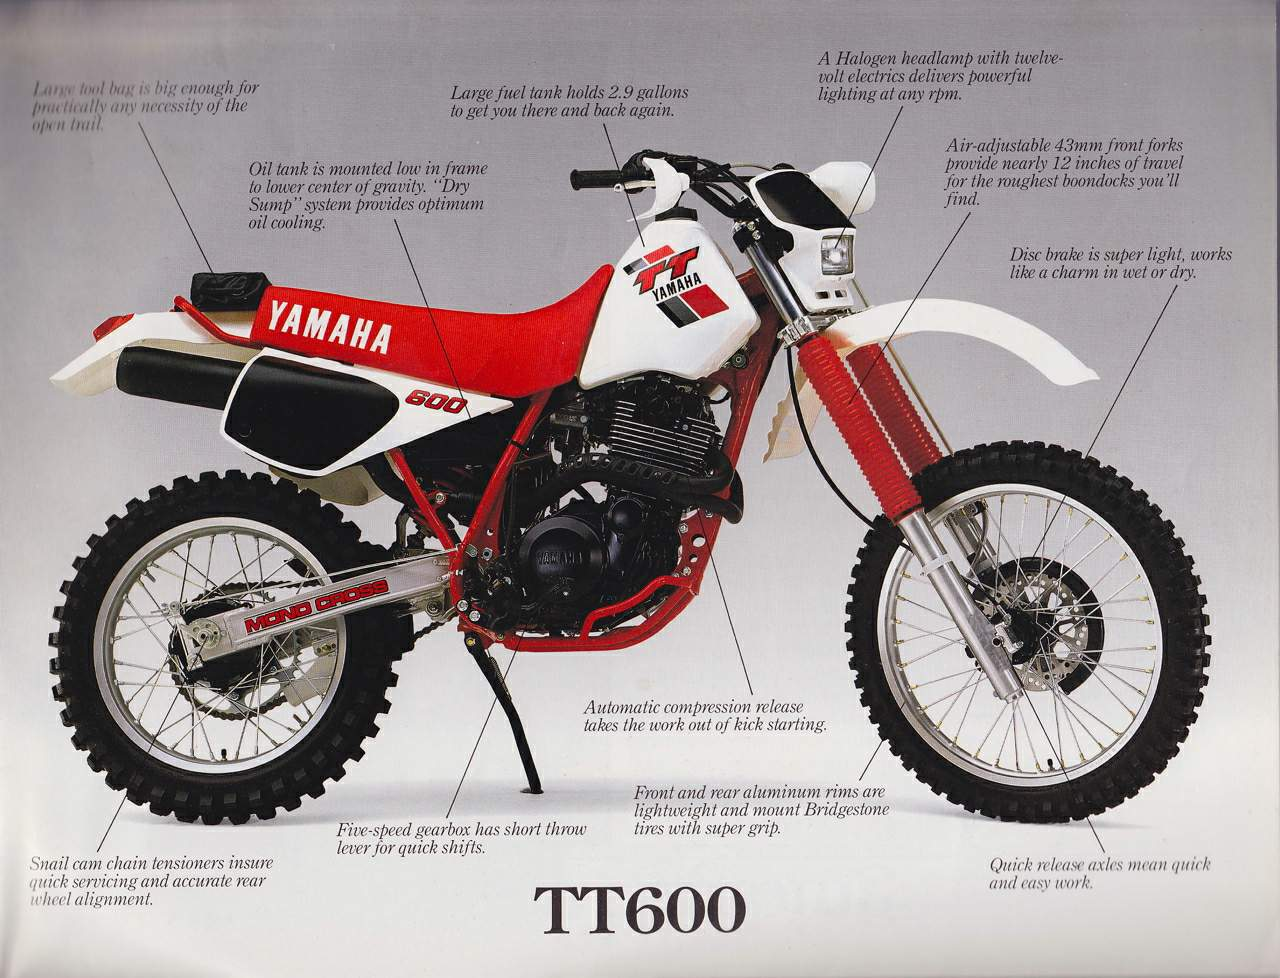 Картинки по запросу Yamaha TTR 600R картинка